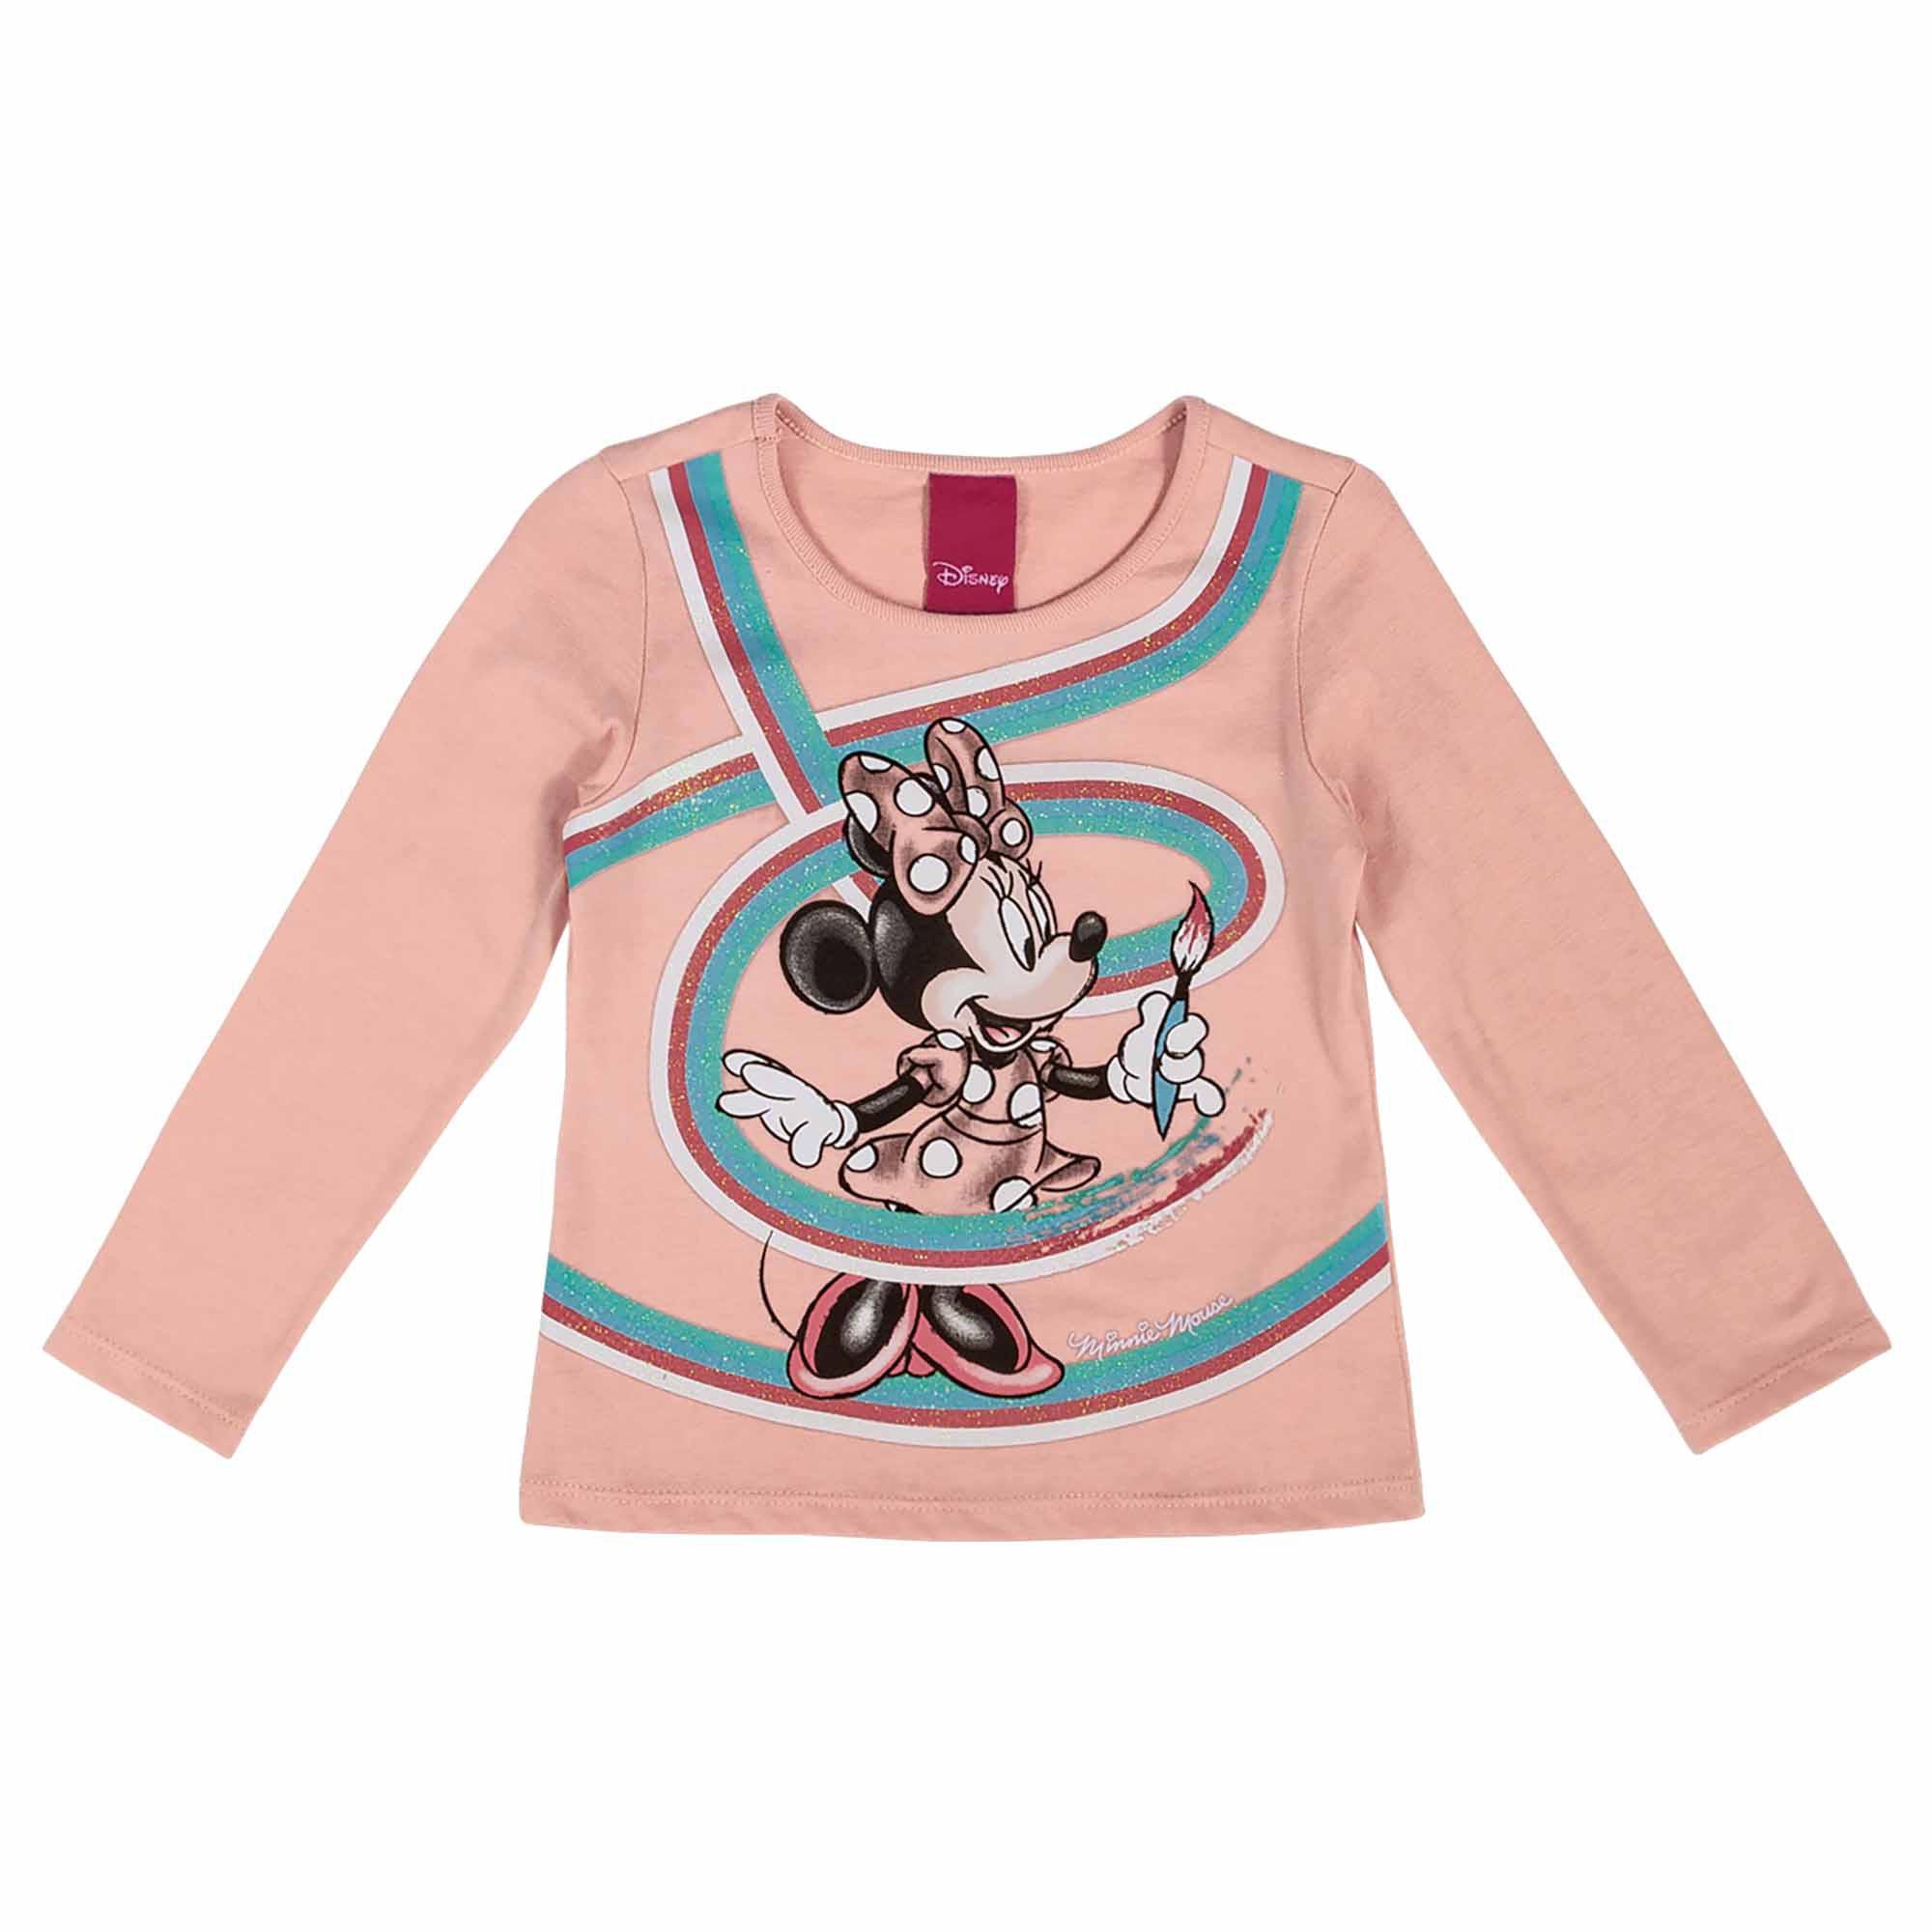 Blusa Manga Longa Cativa Estampa Glitter Minnie Pintando com Pincel - 1 ao 3